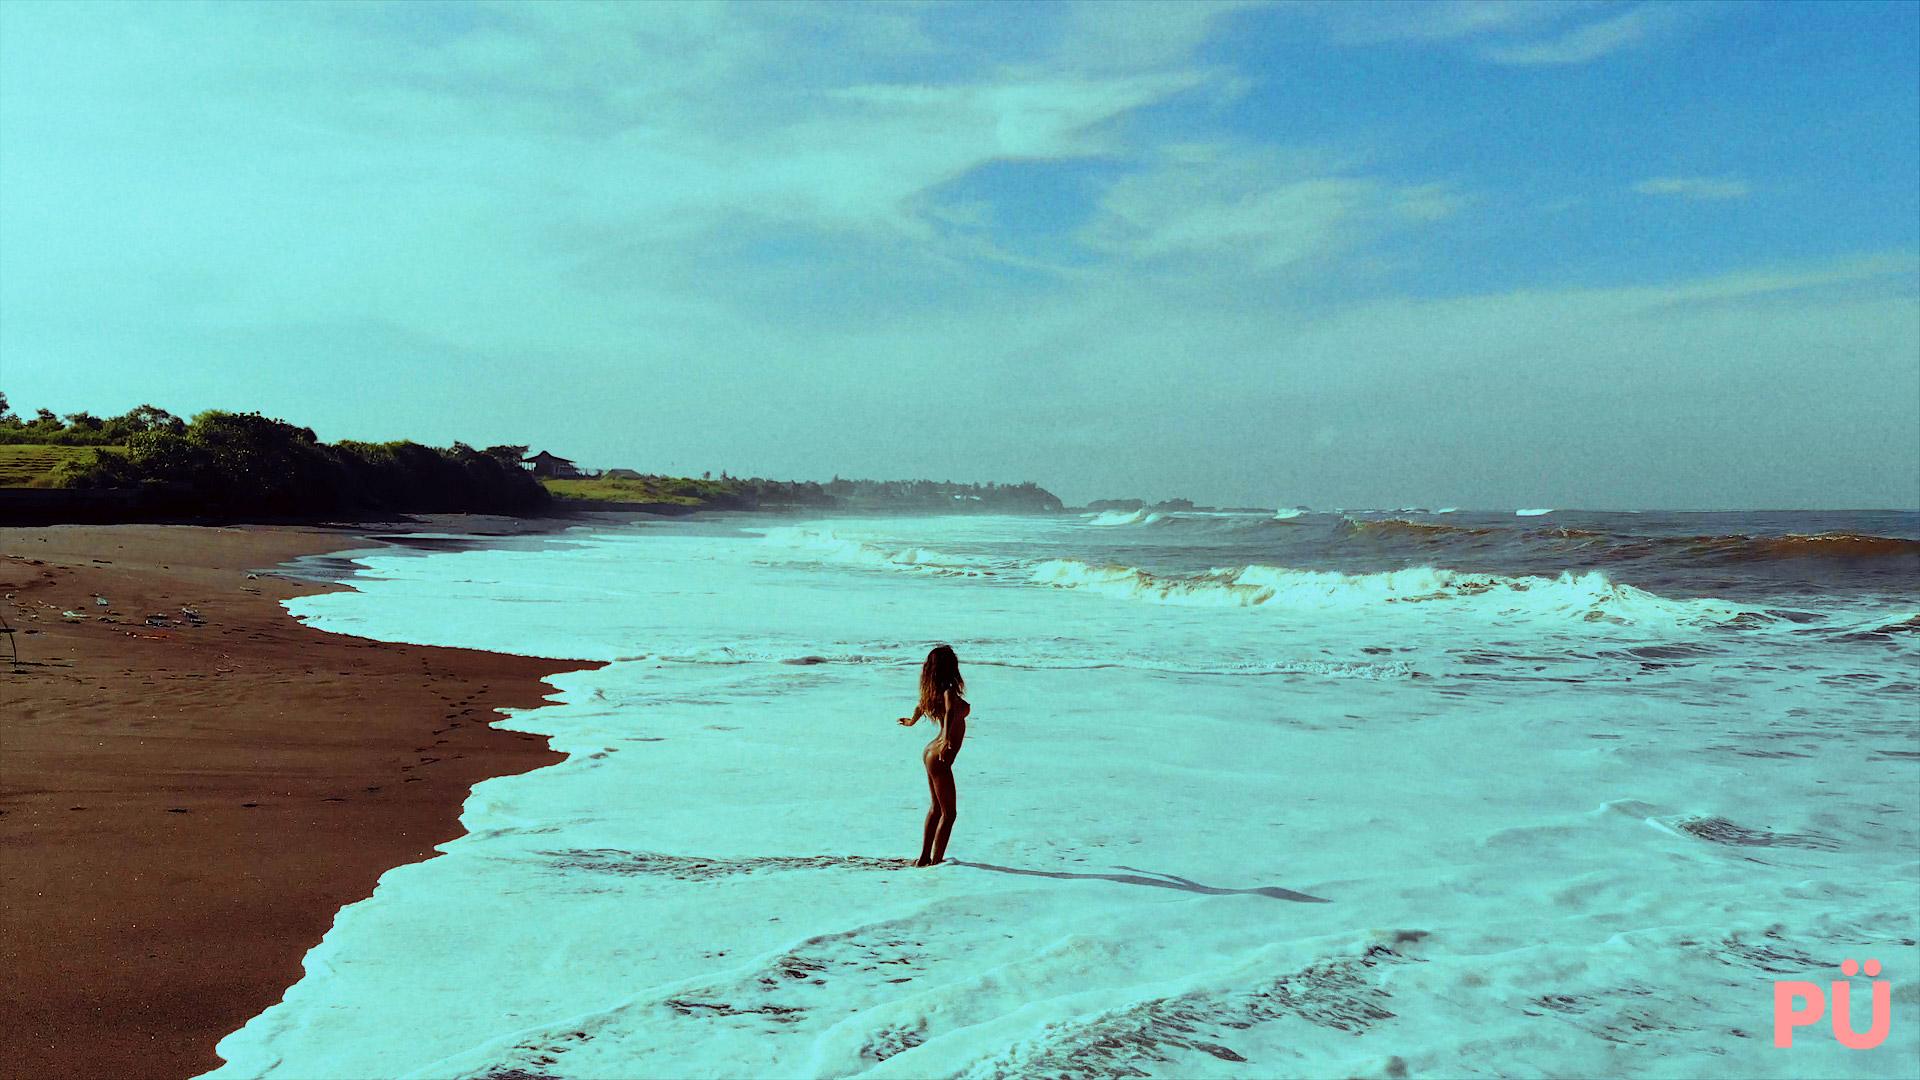 018-Black-Oilie-Sand.00_04_34_31.Still048.jpg